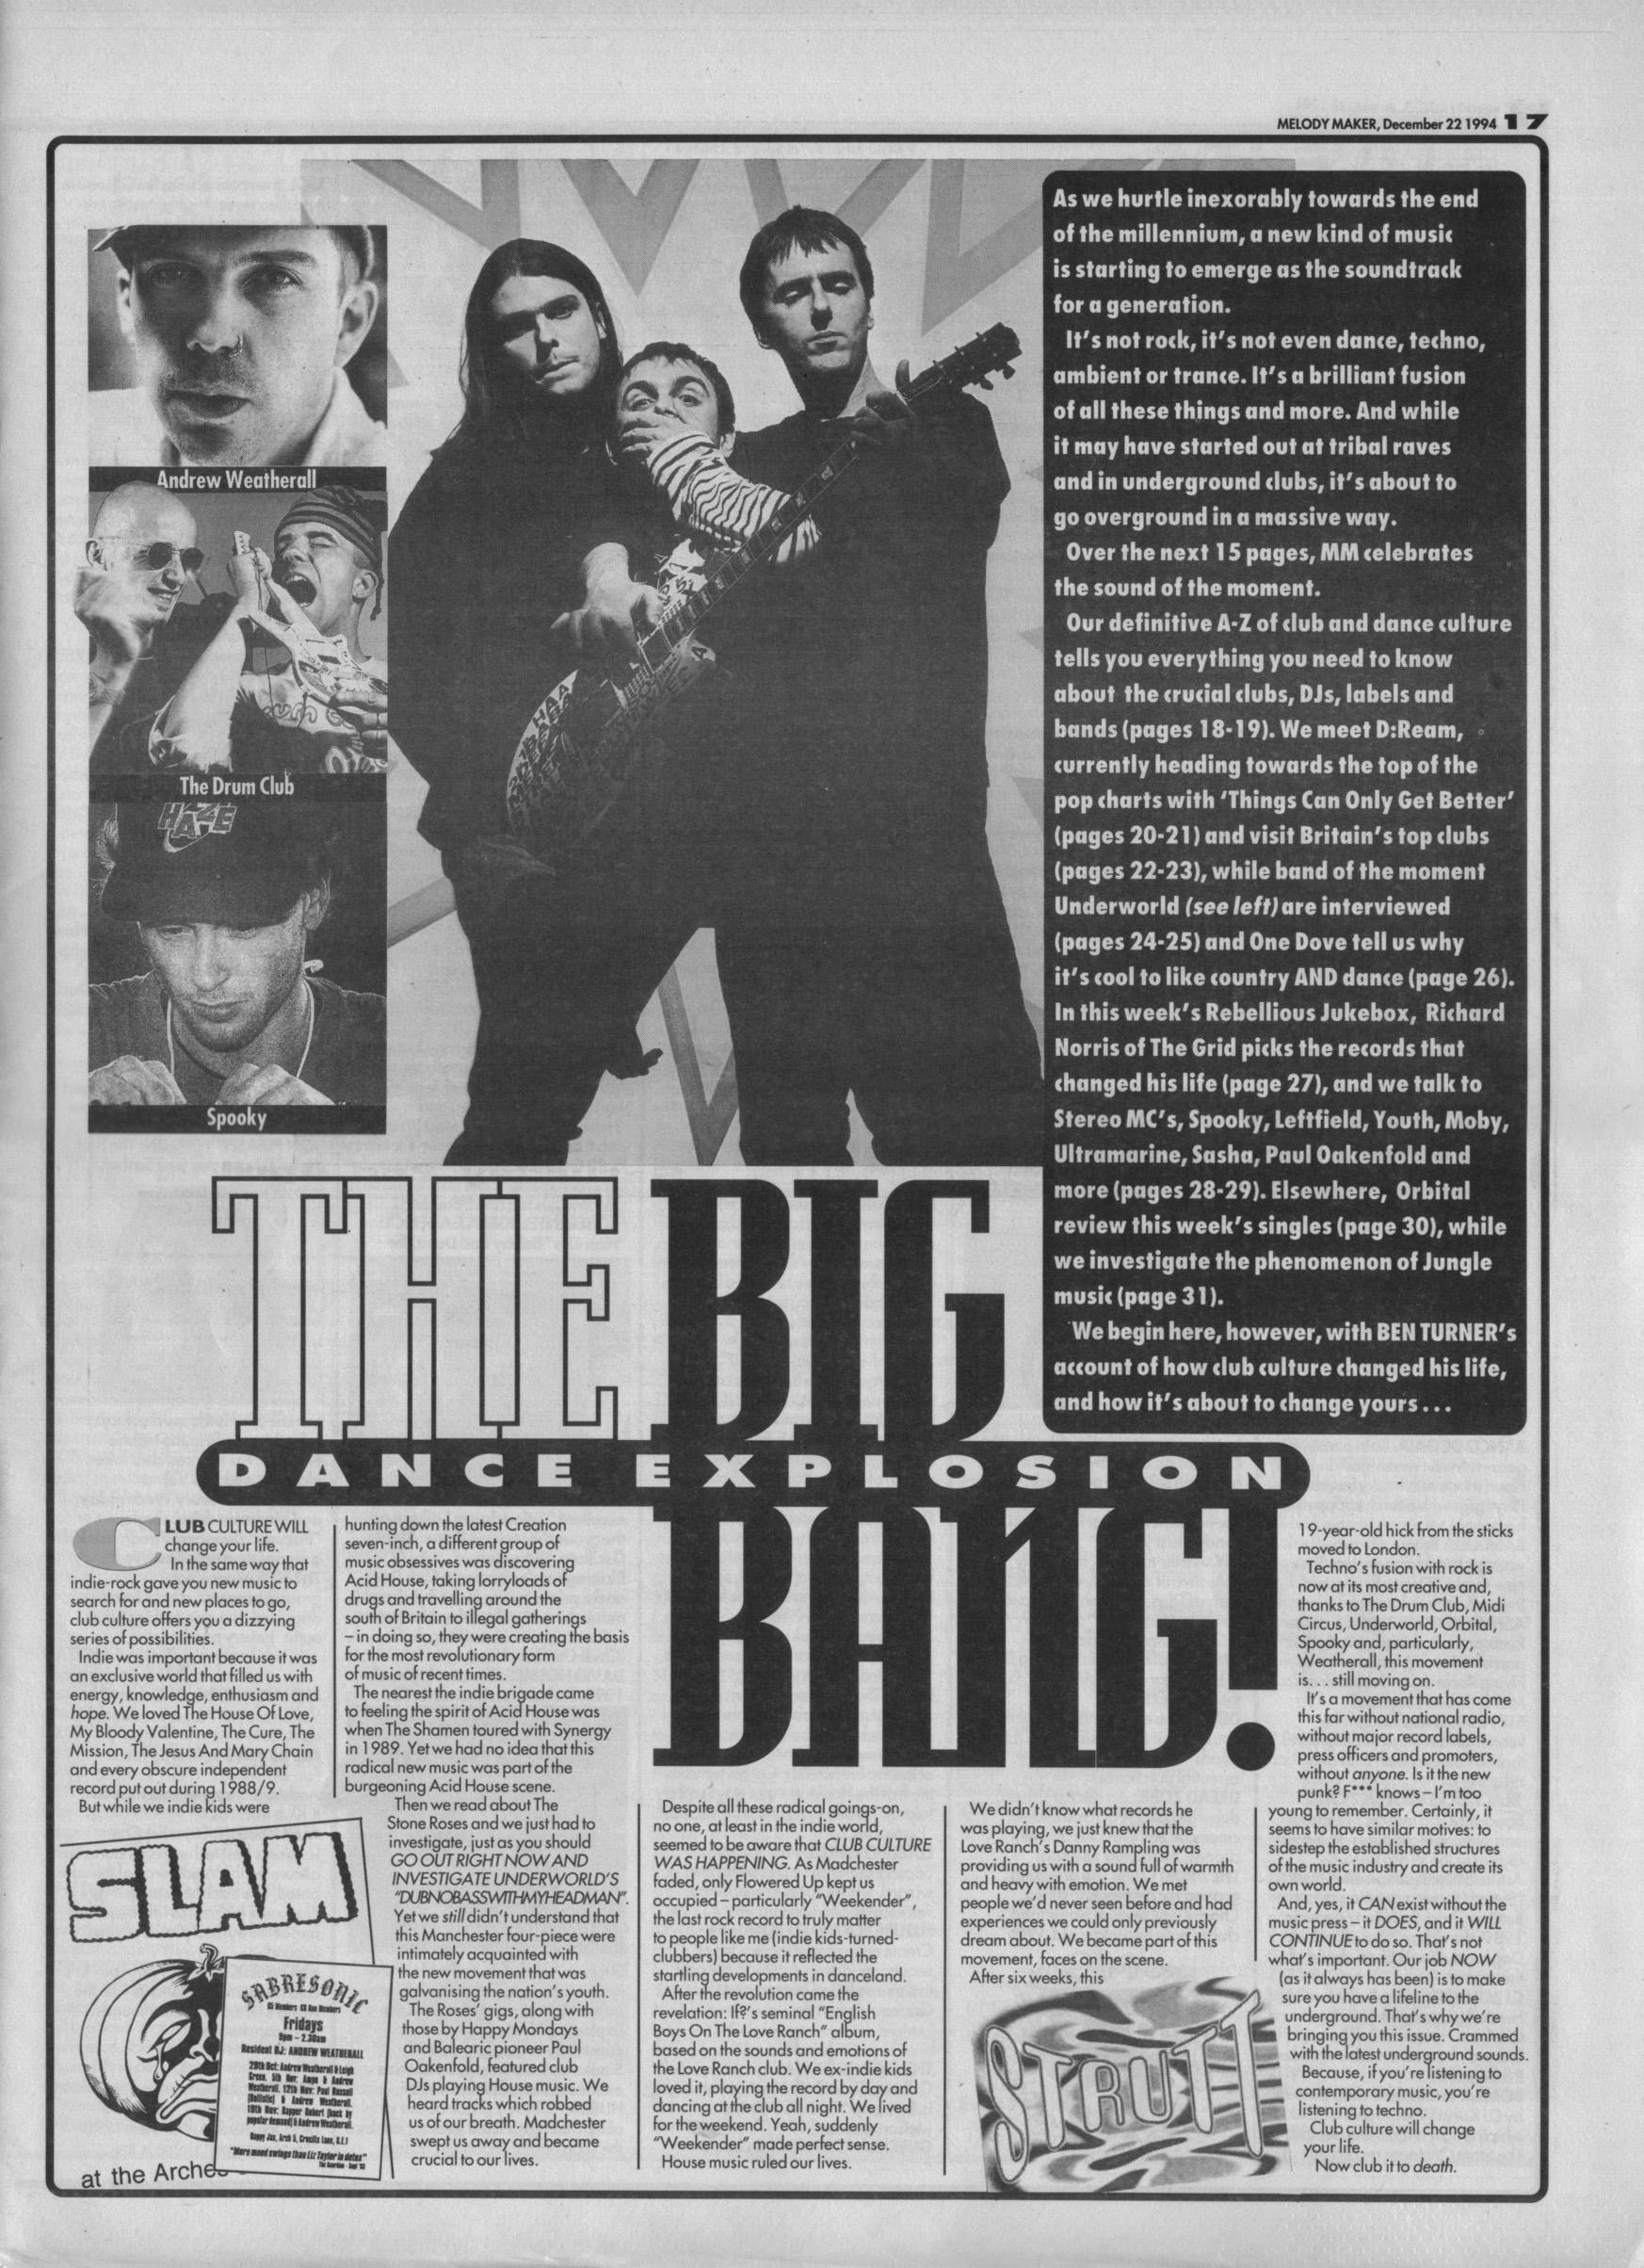 The Big Dance Explosion Bang, 22nd January 1994